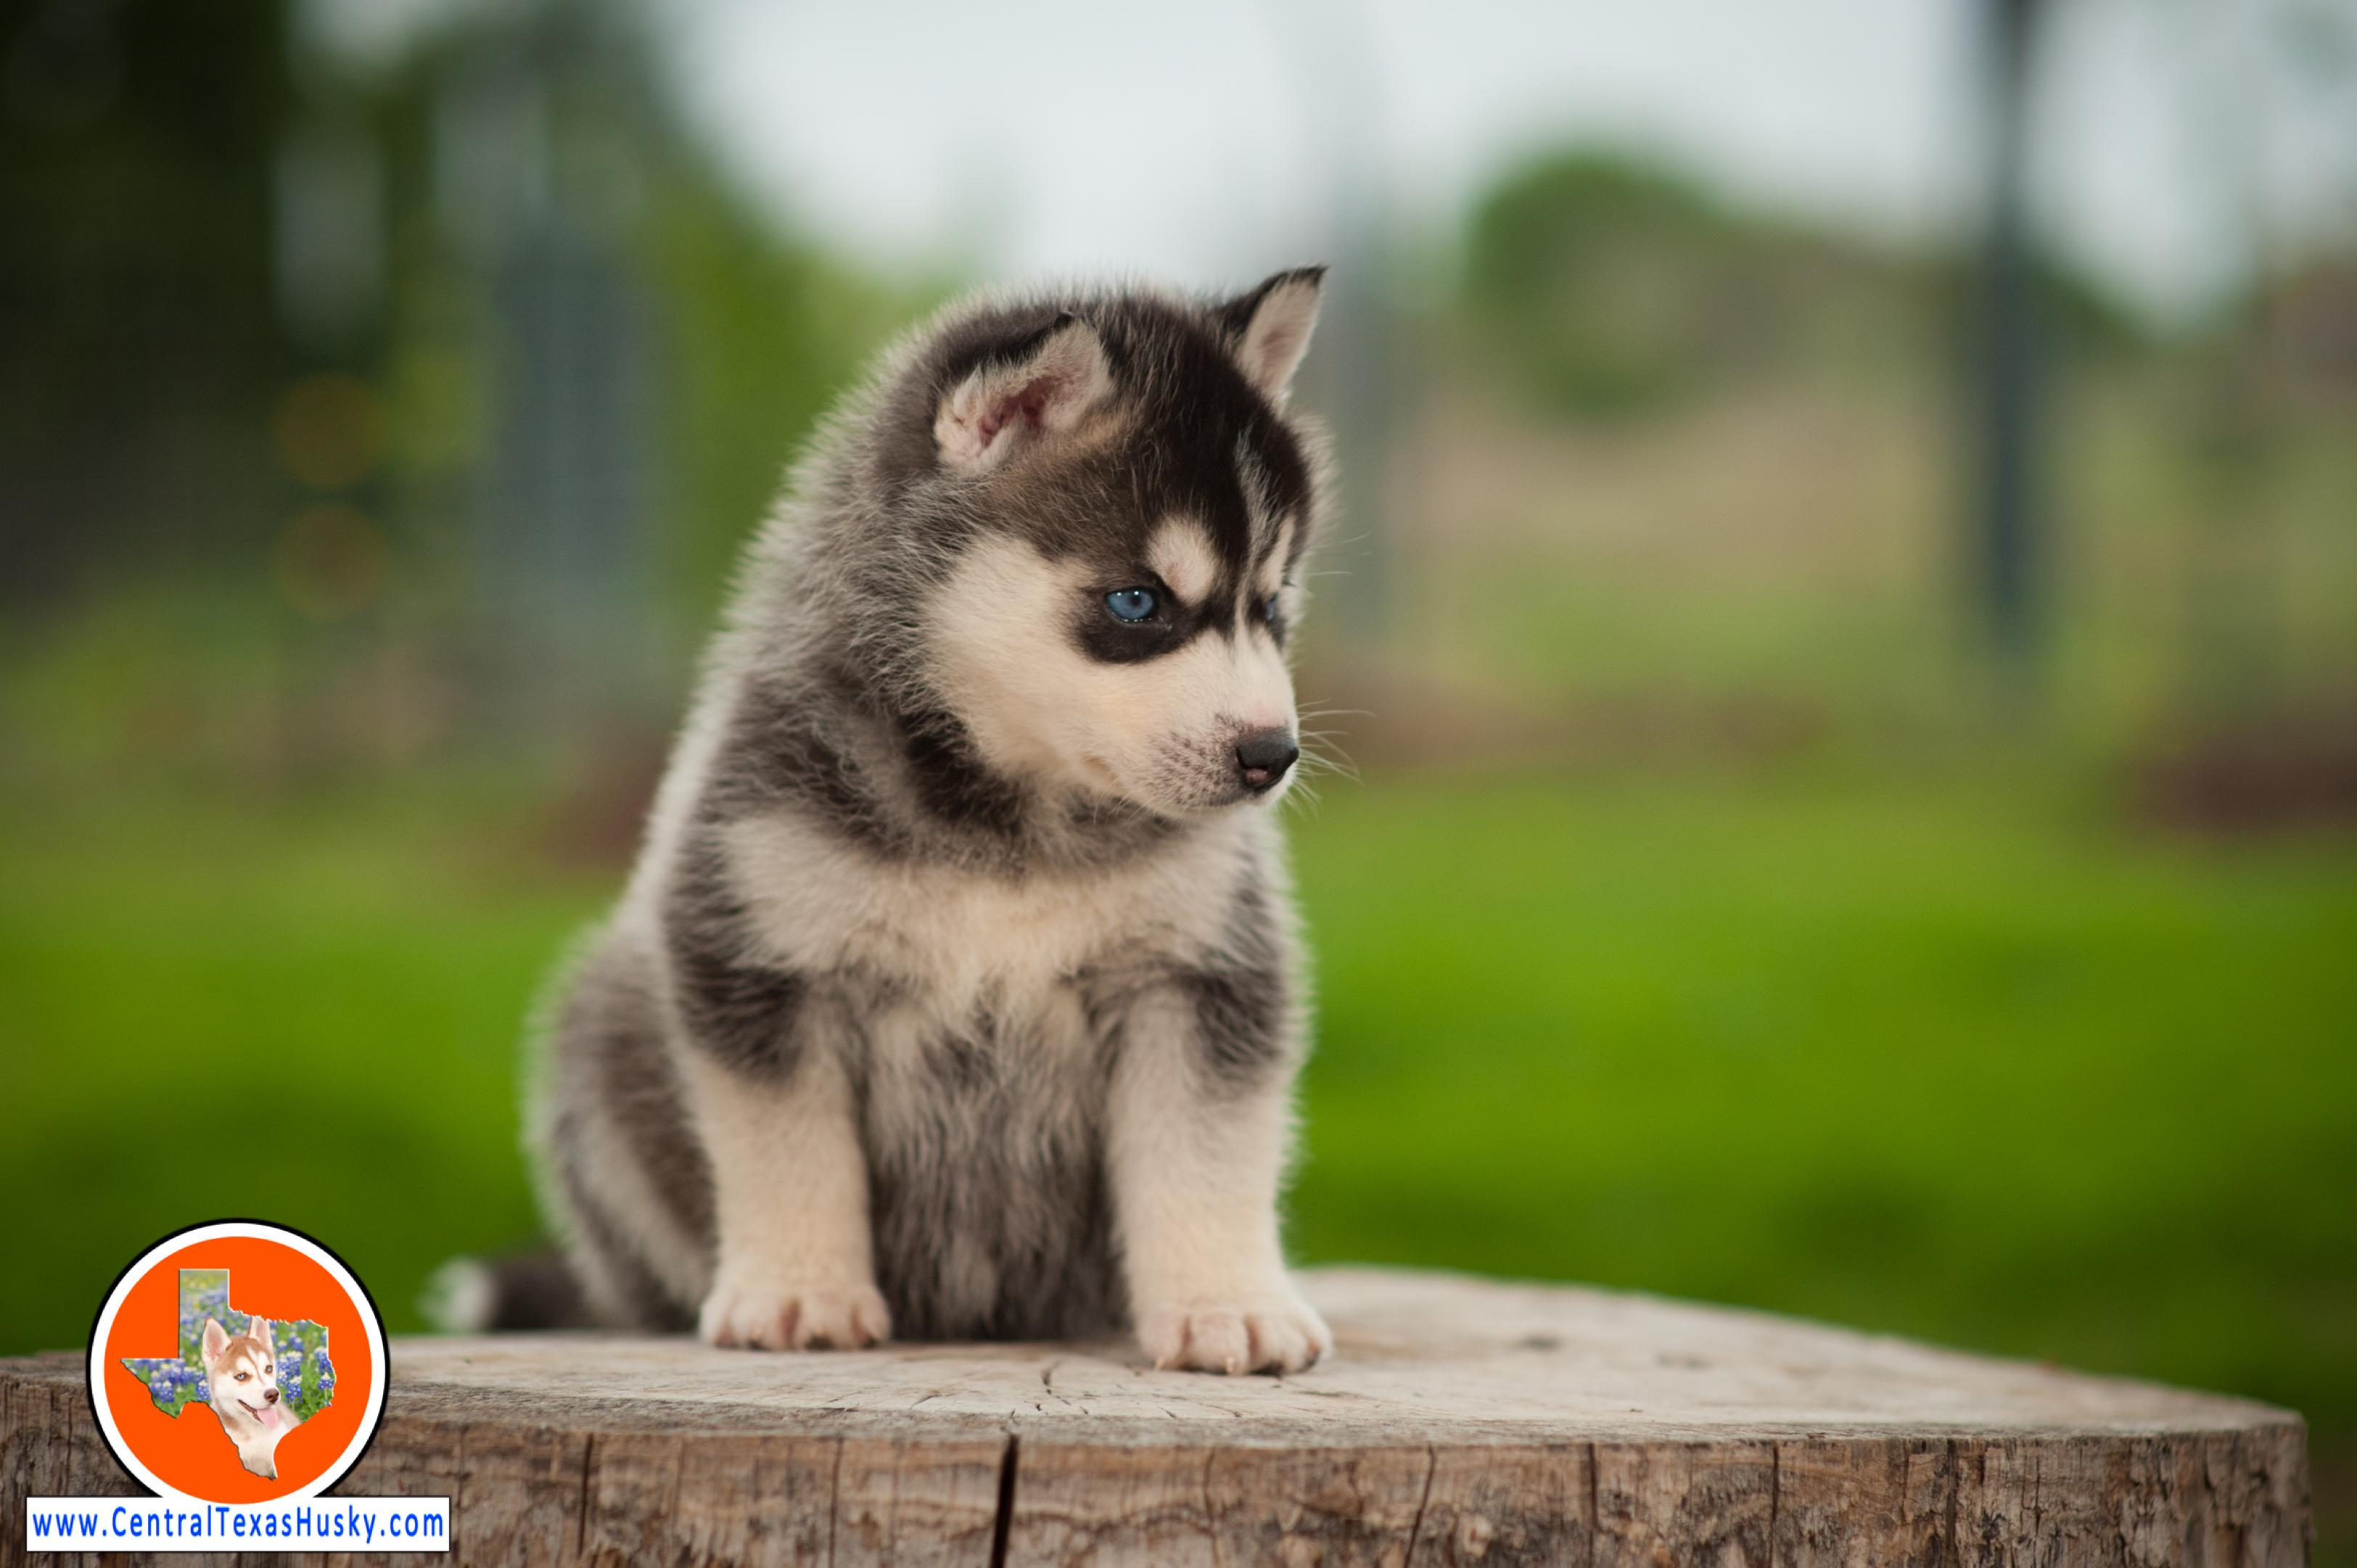 central-texas-husky_austin-siberian-husky-breeder_703955_20180324